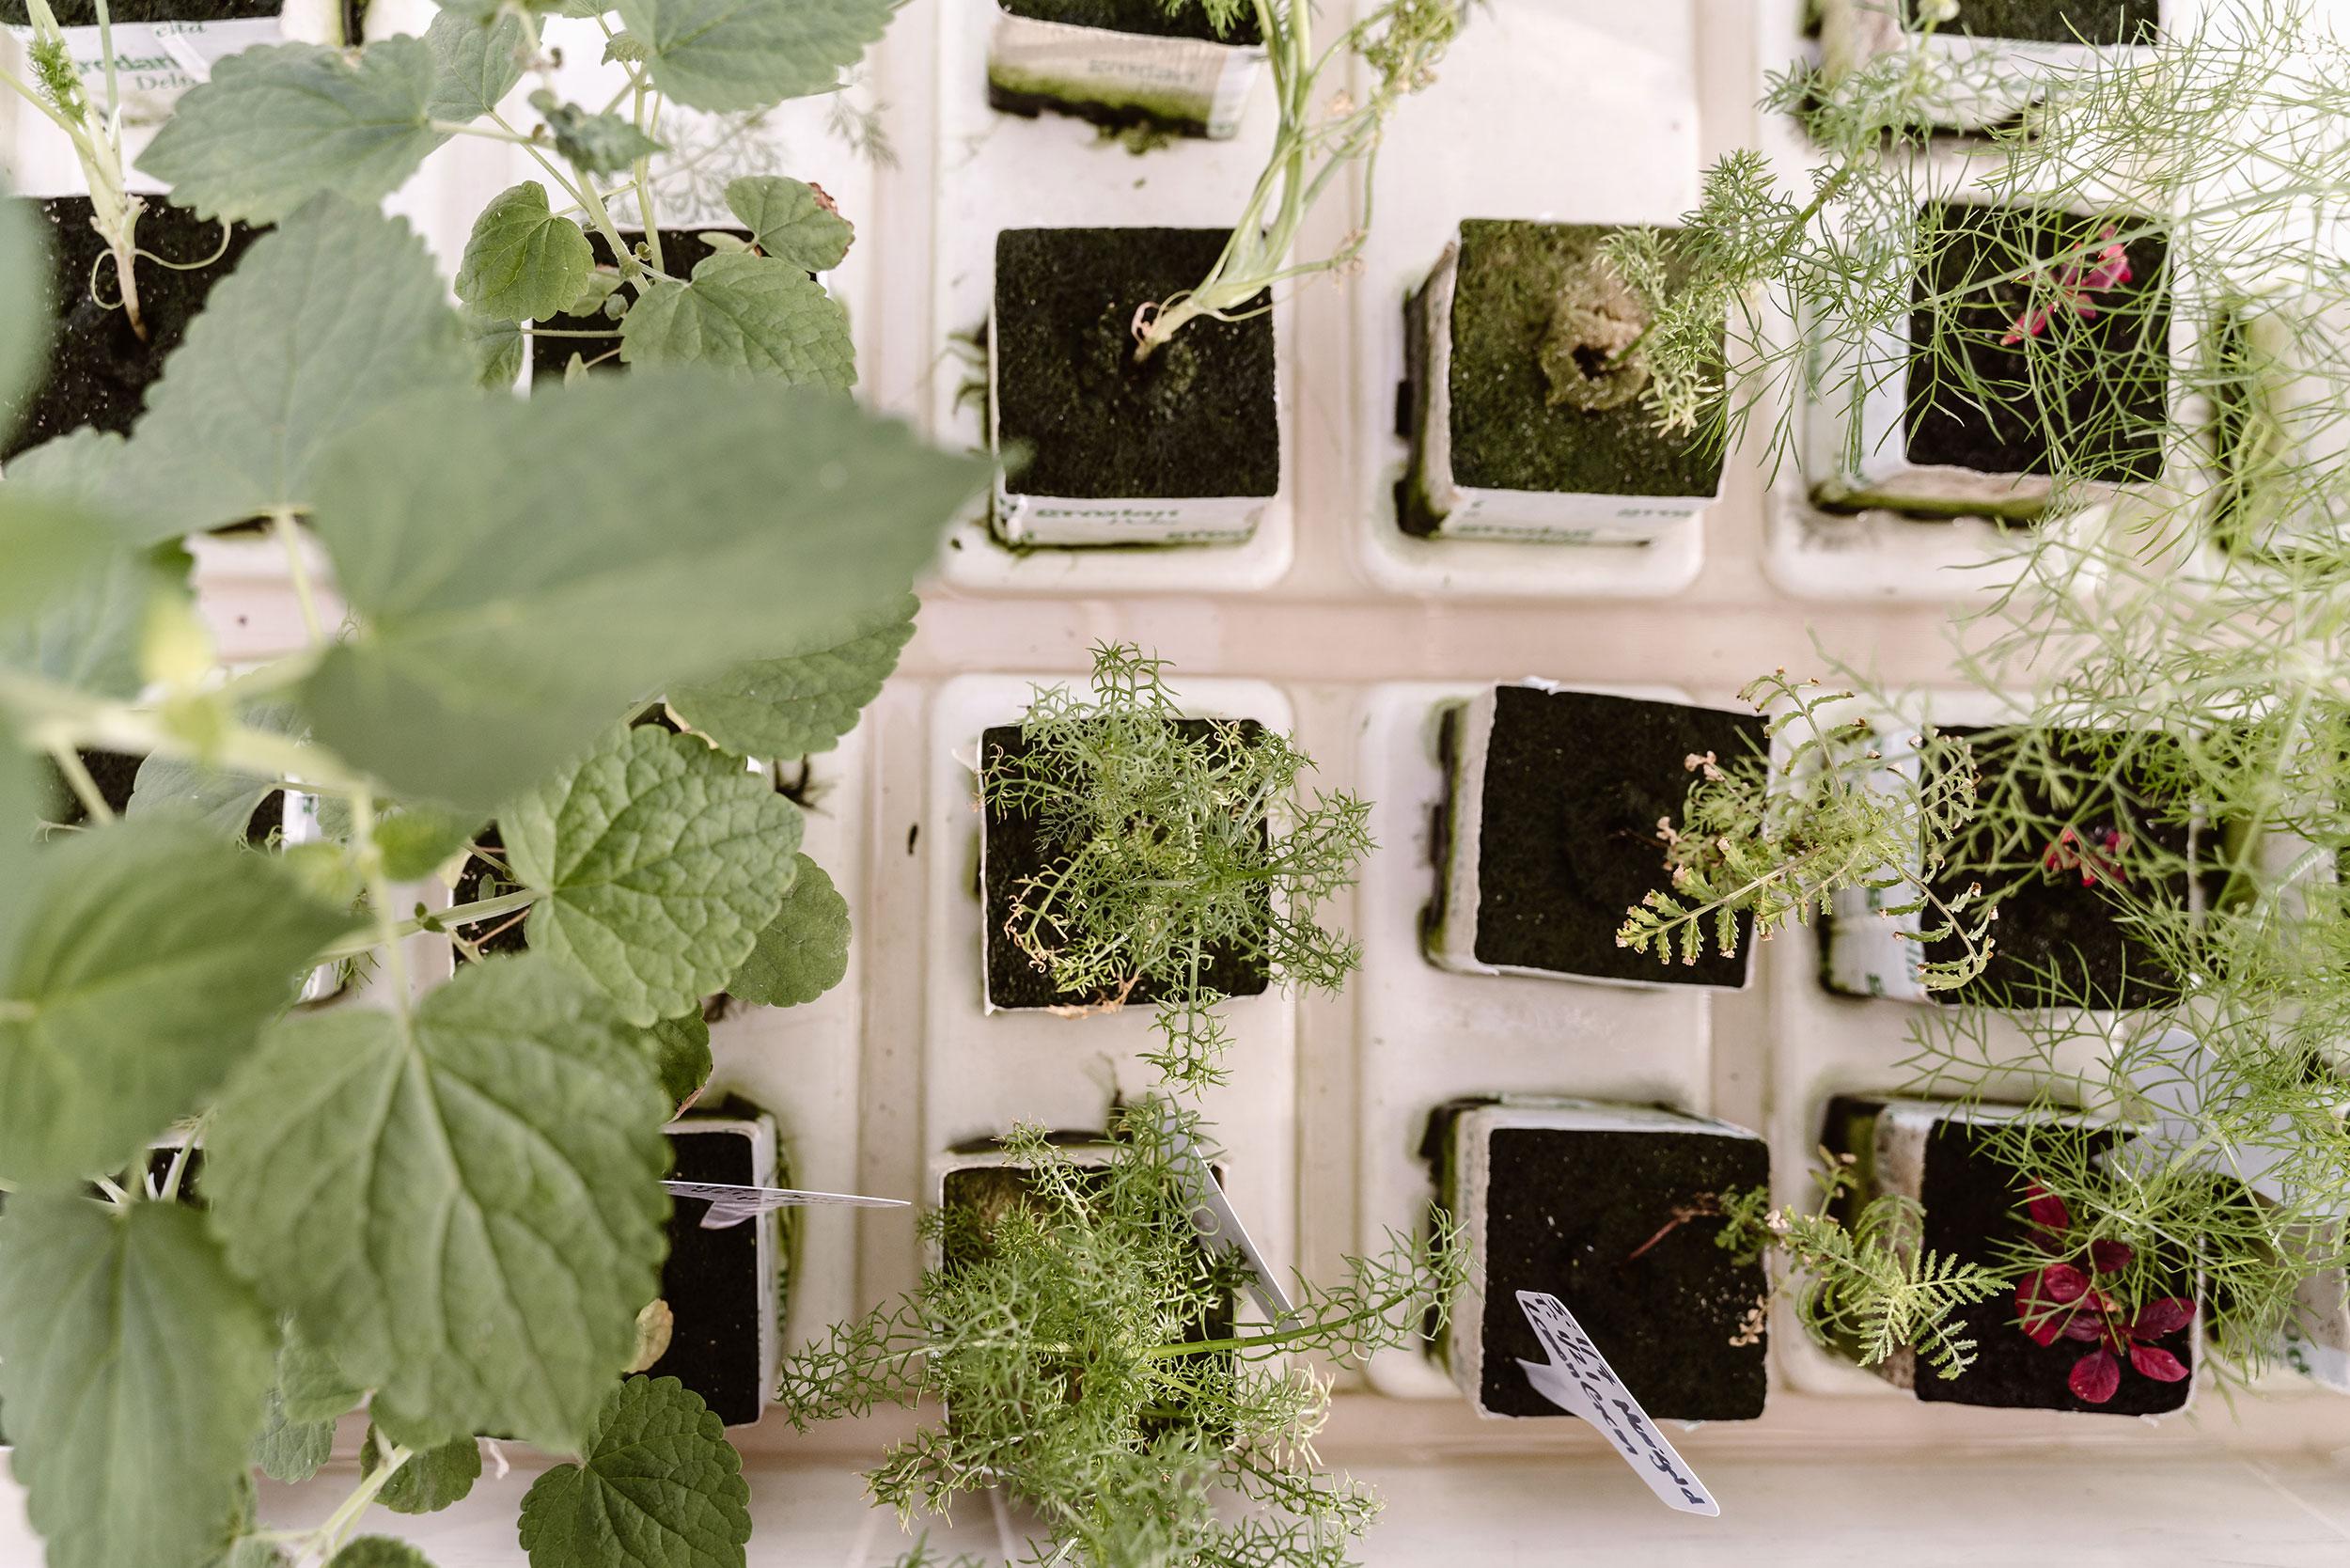 Herban-Produce-_-3-19-19-(54-of-55).jpg